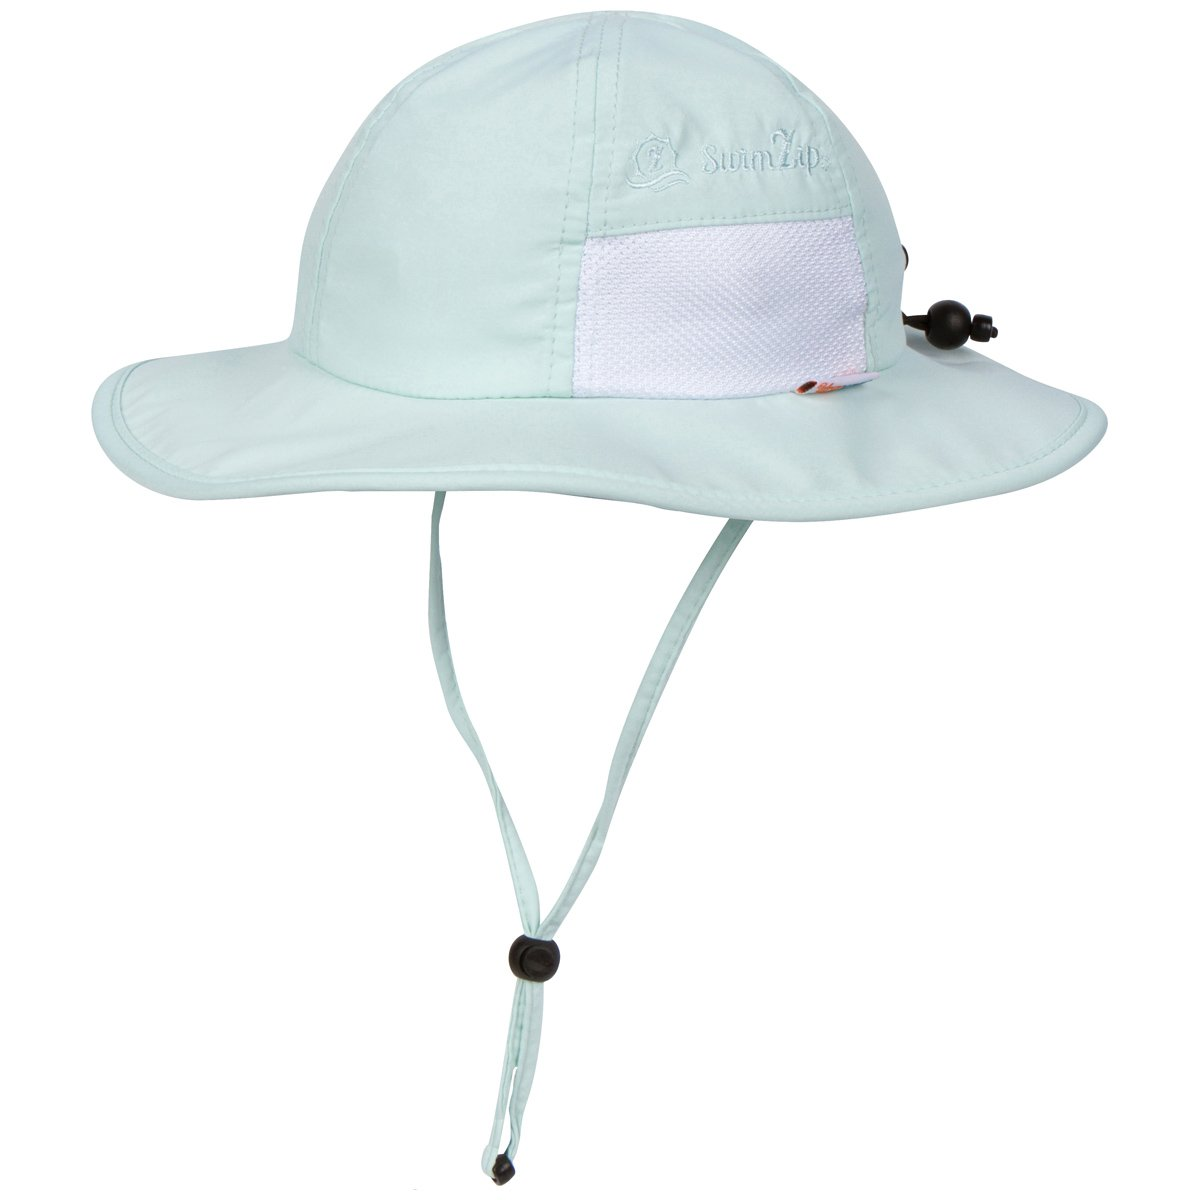 SwimZip Unisex Child Wide Brim Sun Protection Hat UPF 50 Adjustable